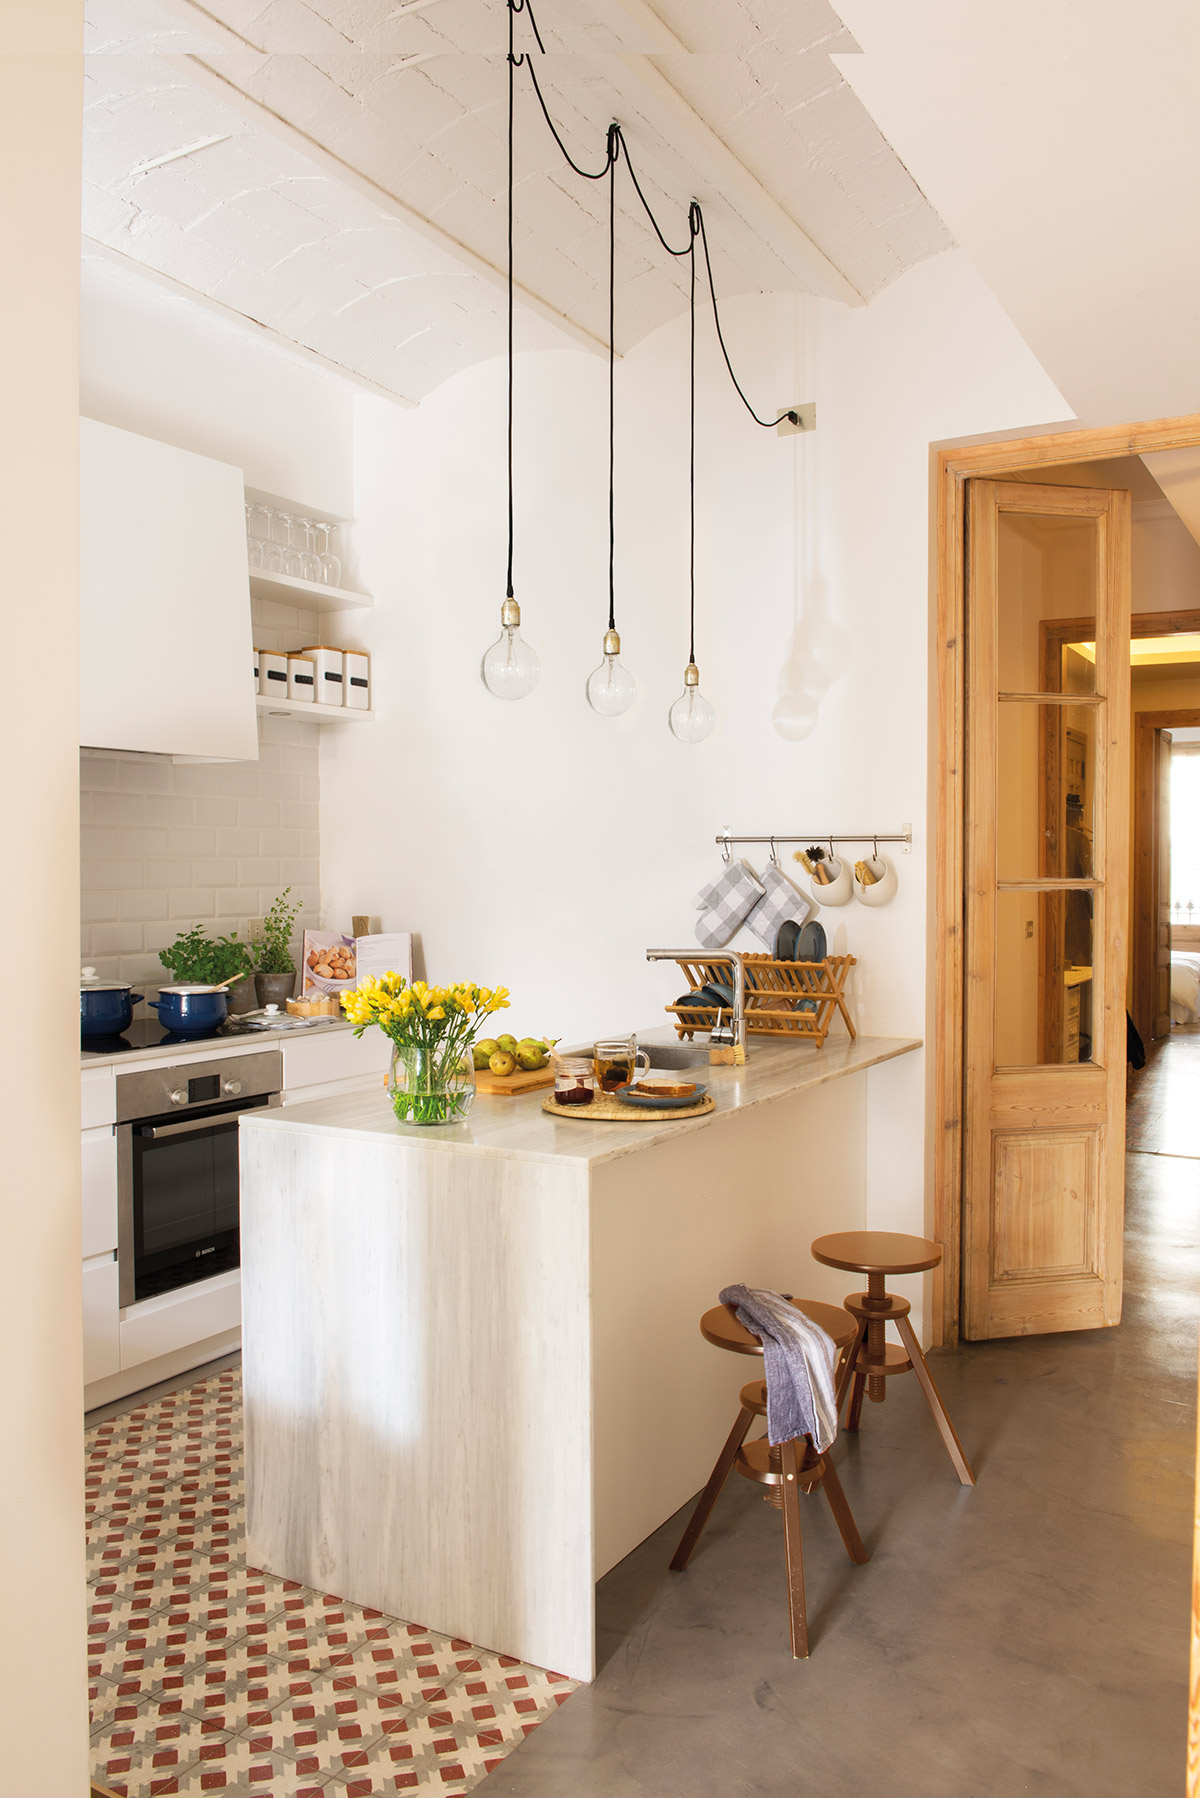 Dise o de una cocina con barra de desayuno for Donde estudiar diseno de interiores a distancia